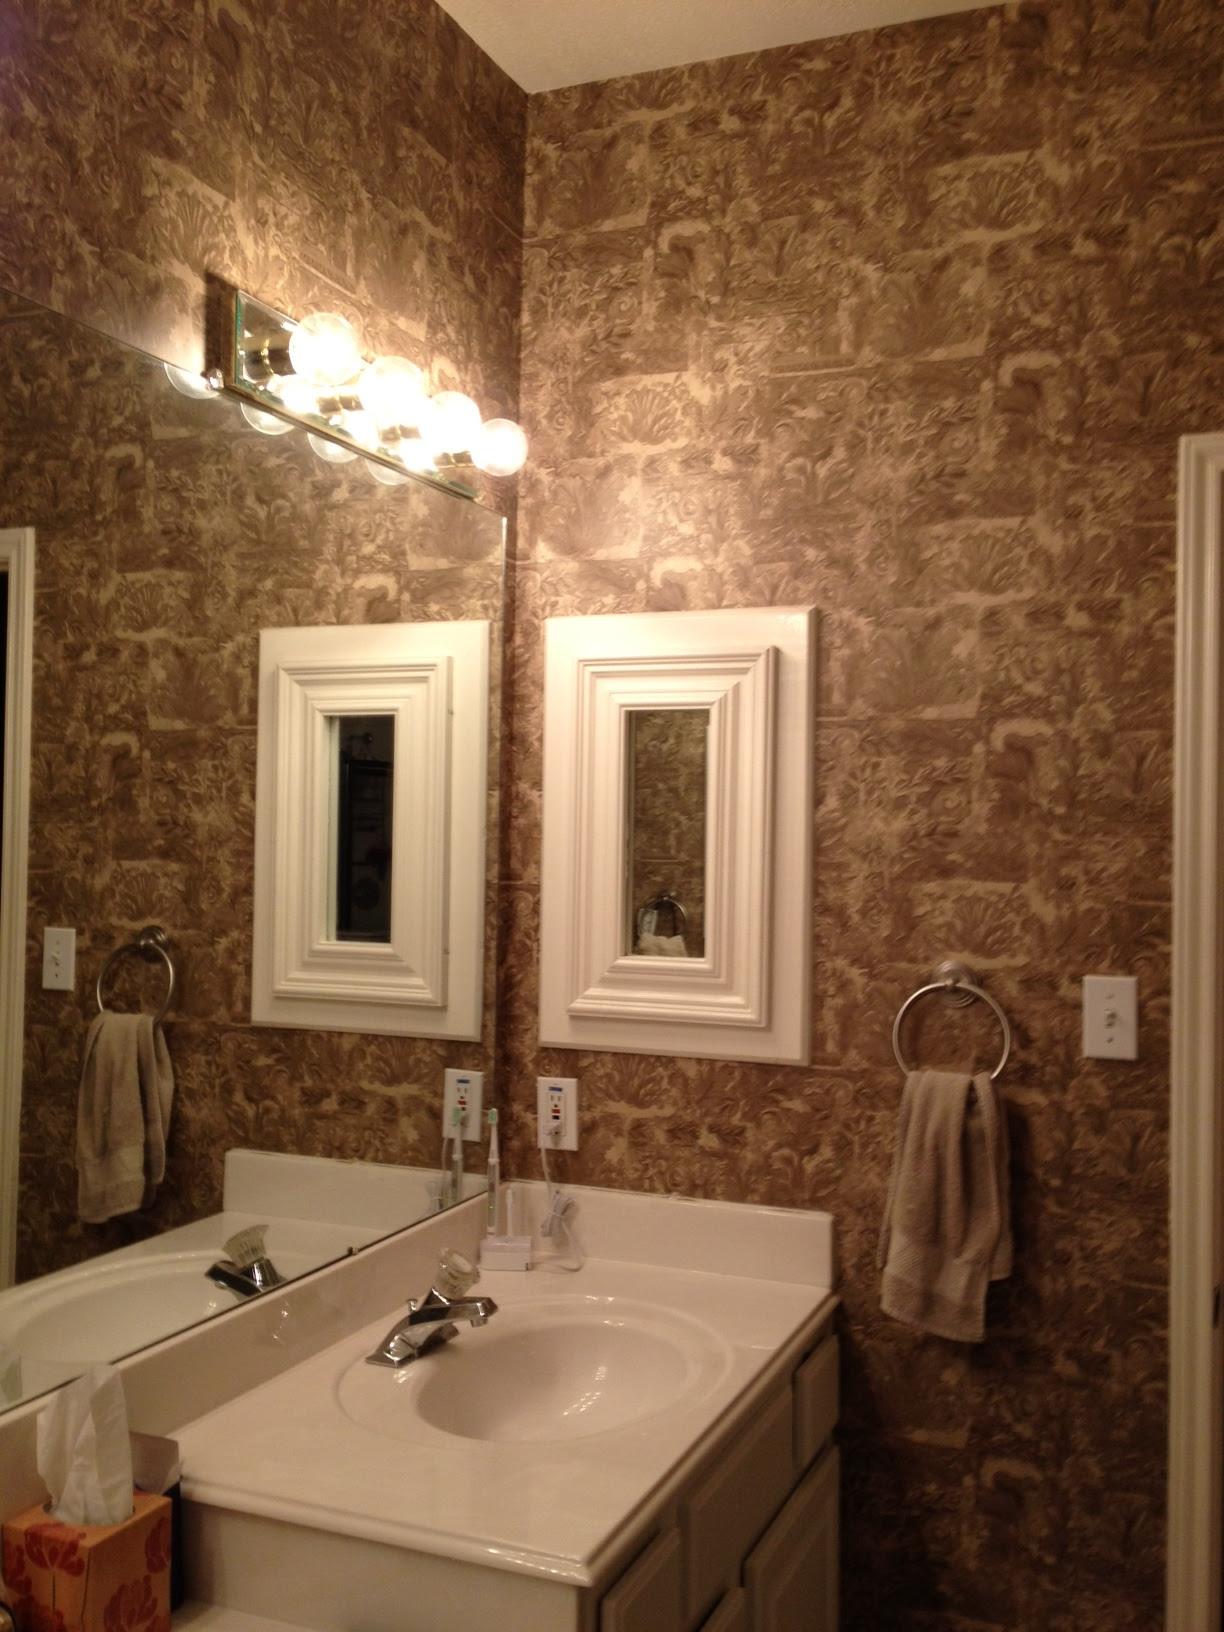 Download Using Wallpaper In Bathrooms Gallery